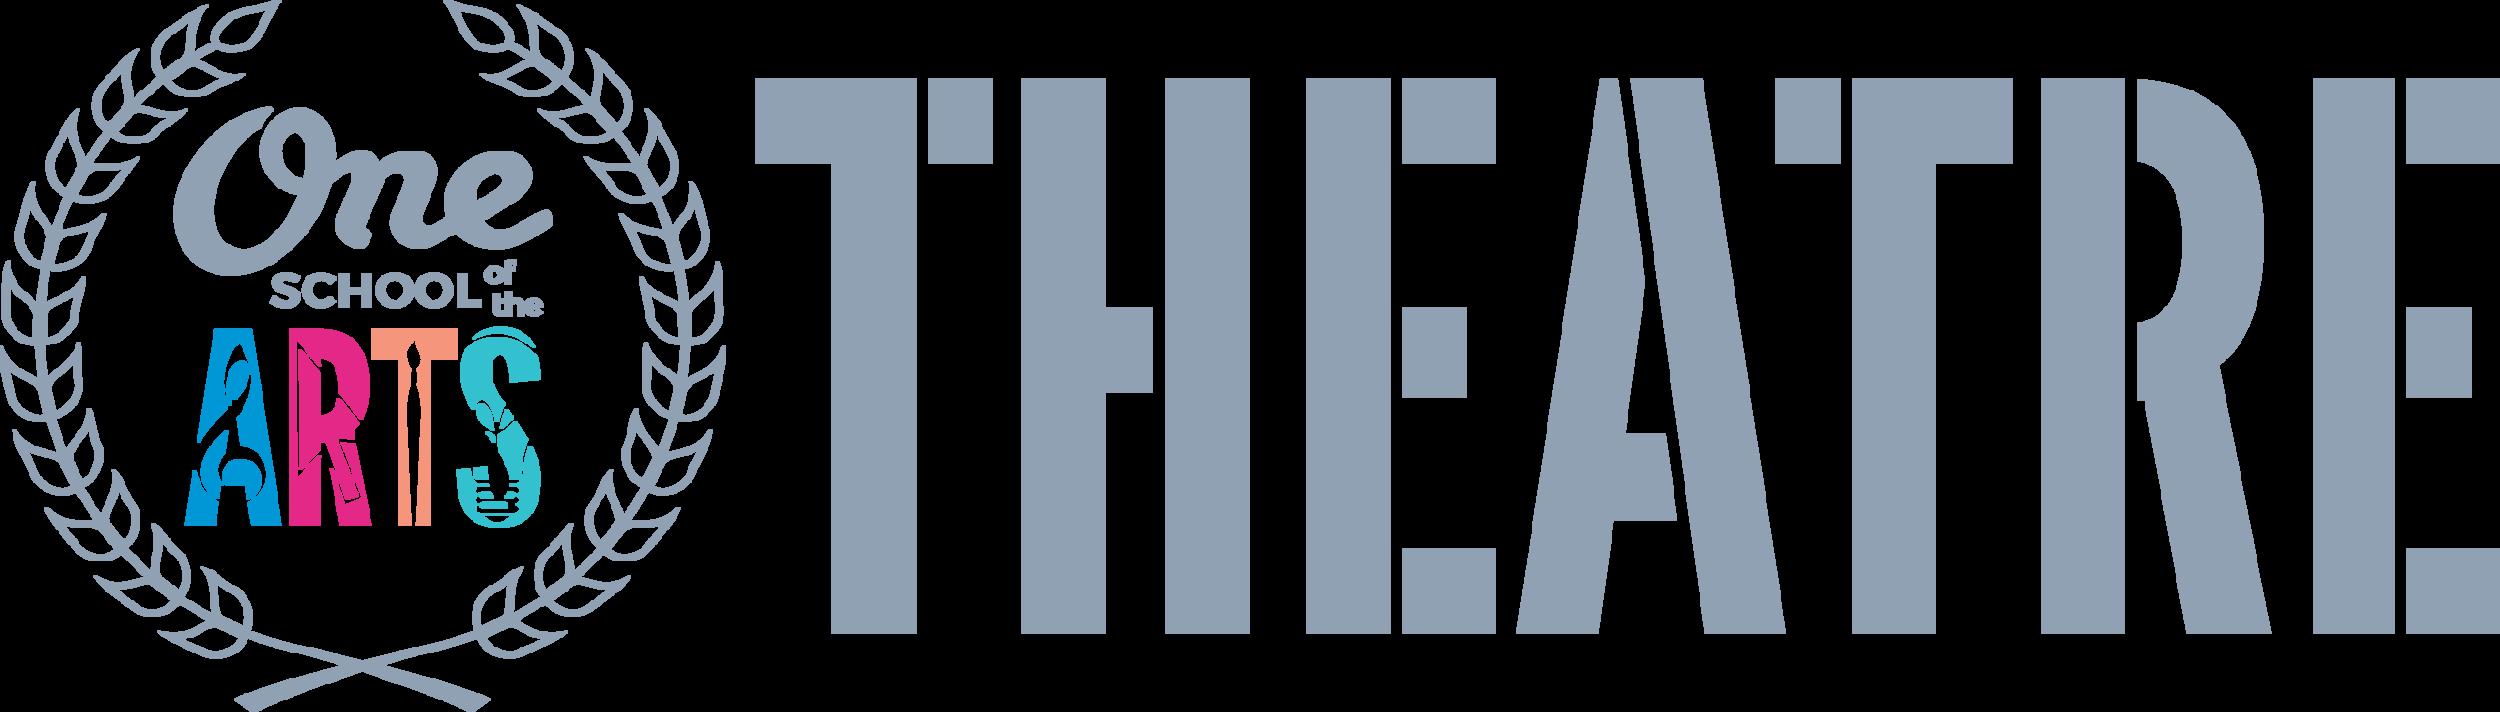 OSOTA_Theatre_logo-dark.png